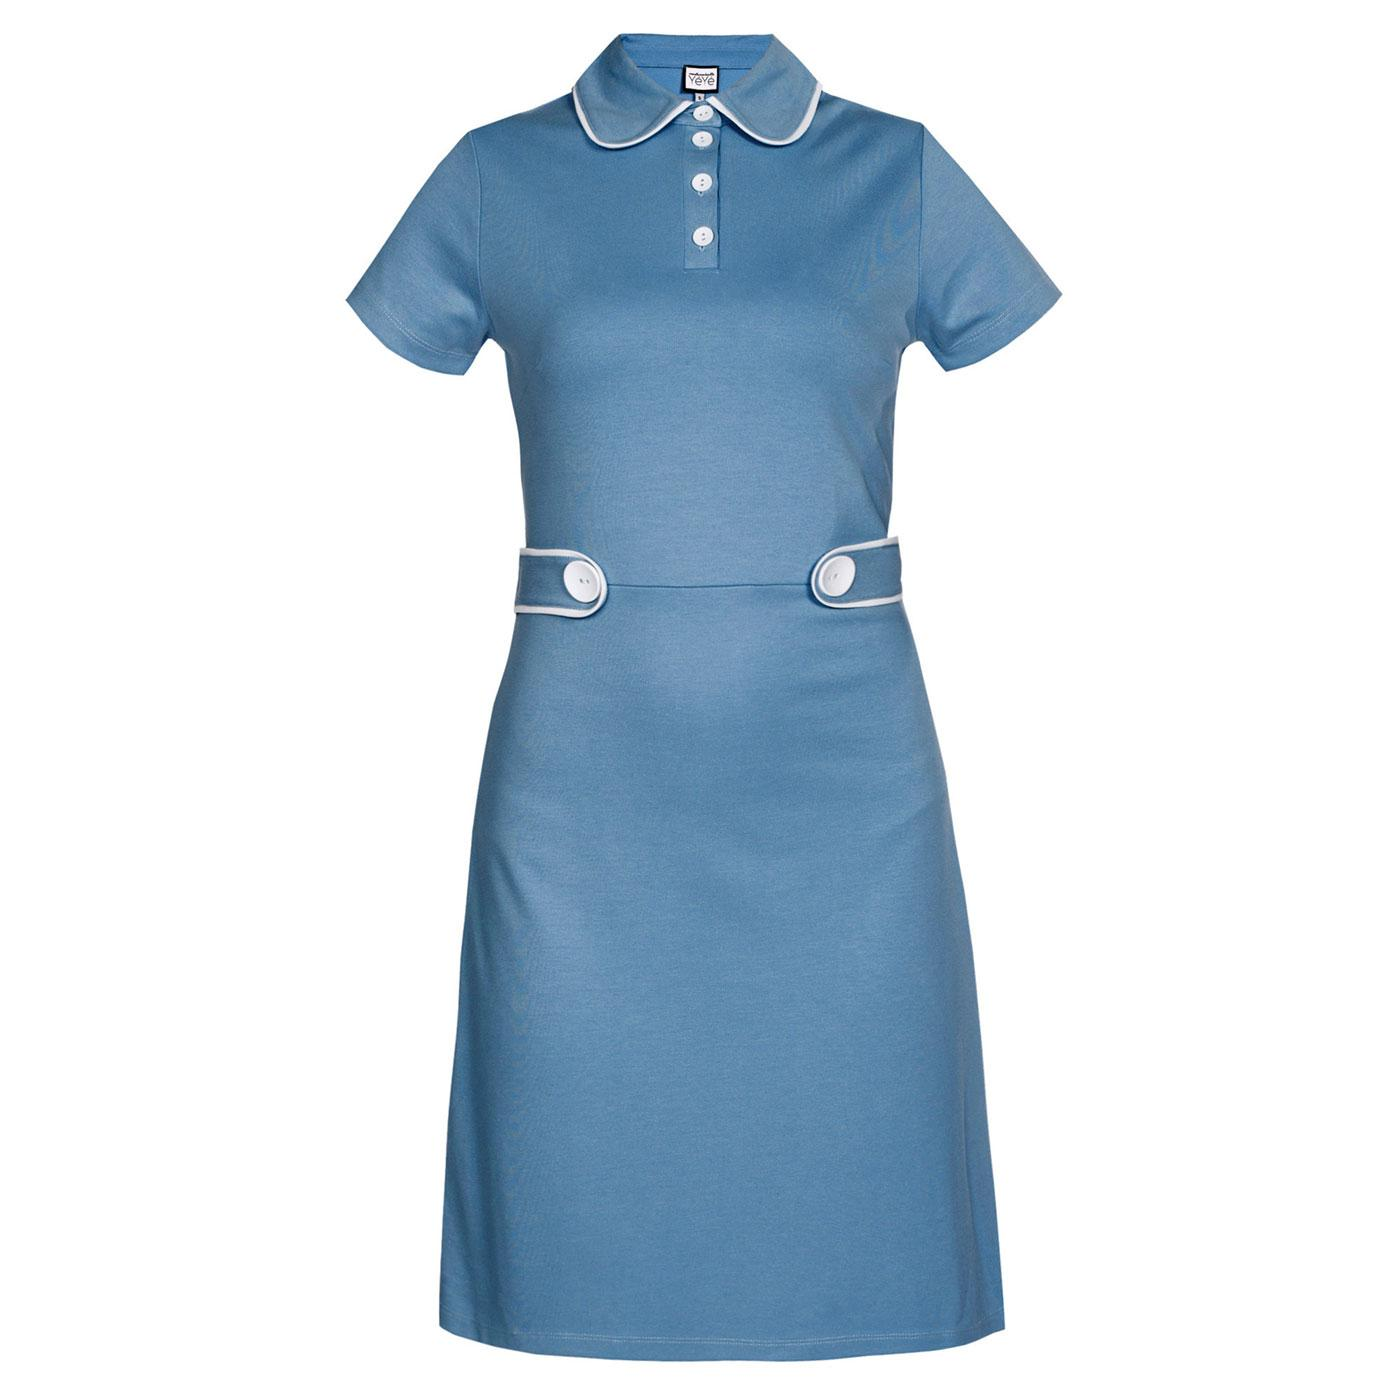 A Trip To Paris MADEMOISELLE YEYE 60s Mod Dress